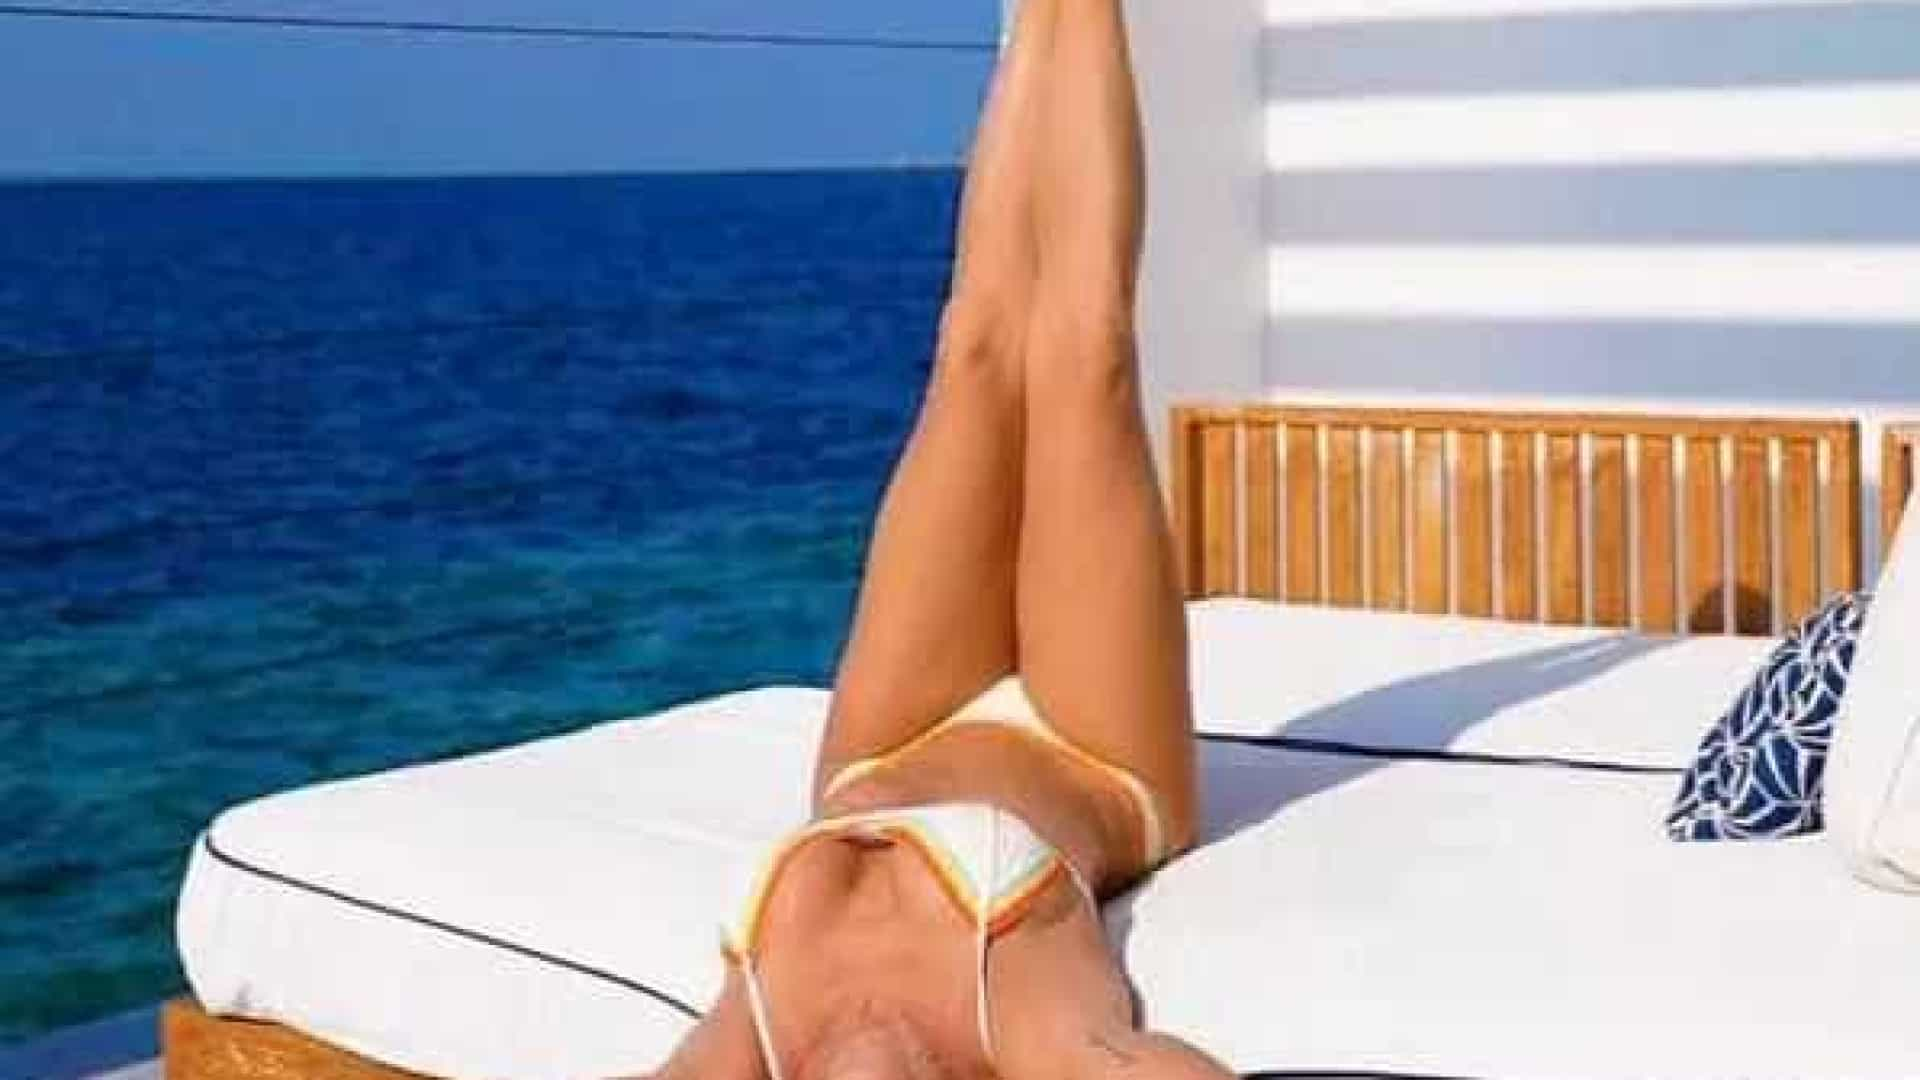 De pernas pro ar, Deborah Secco curte férias nas Maldivas: 'Leve'